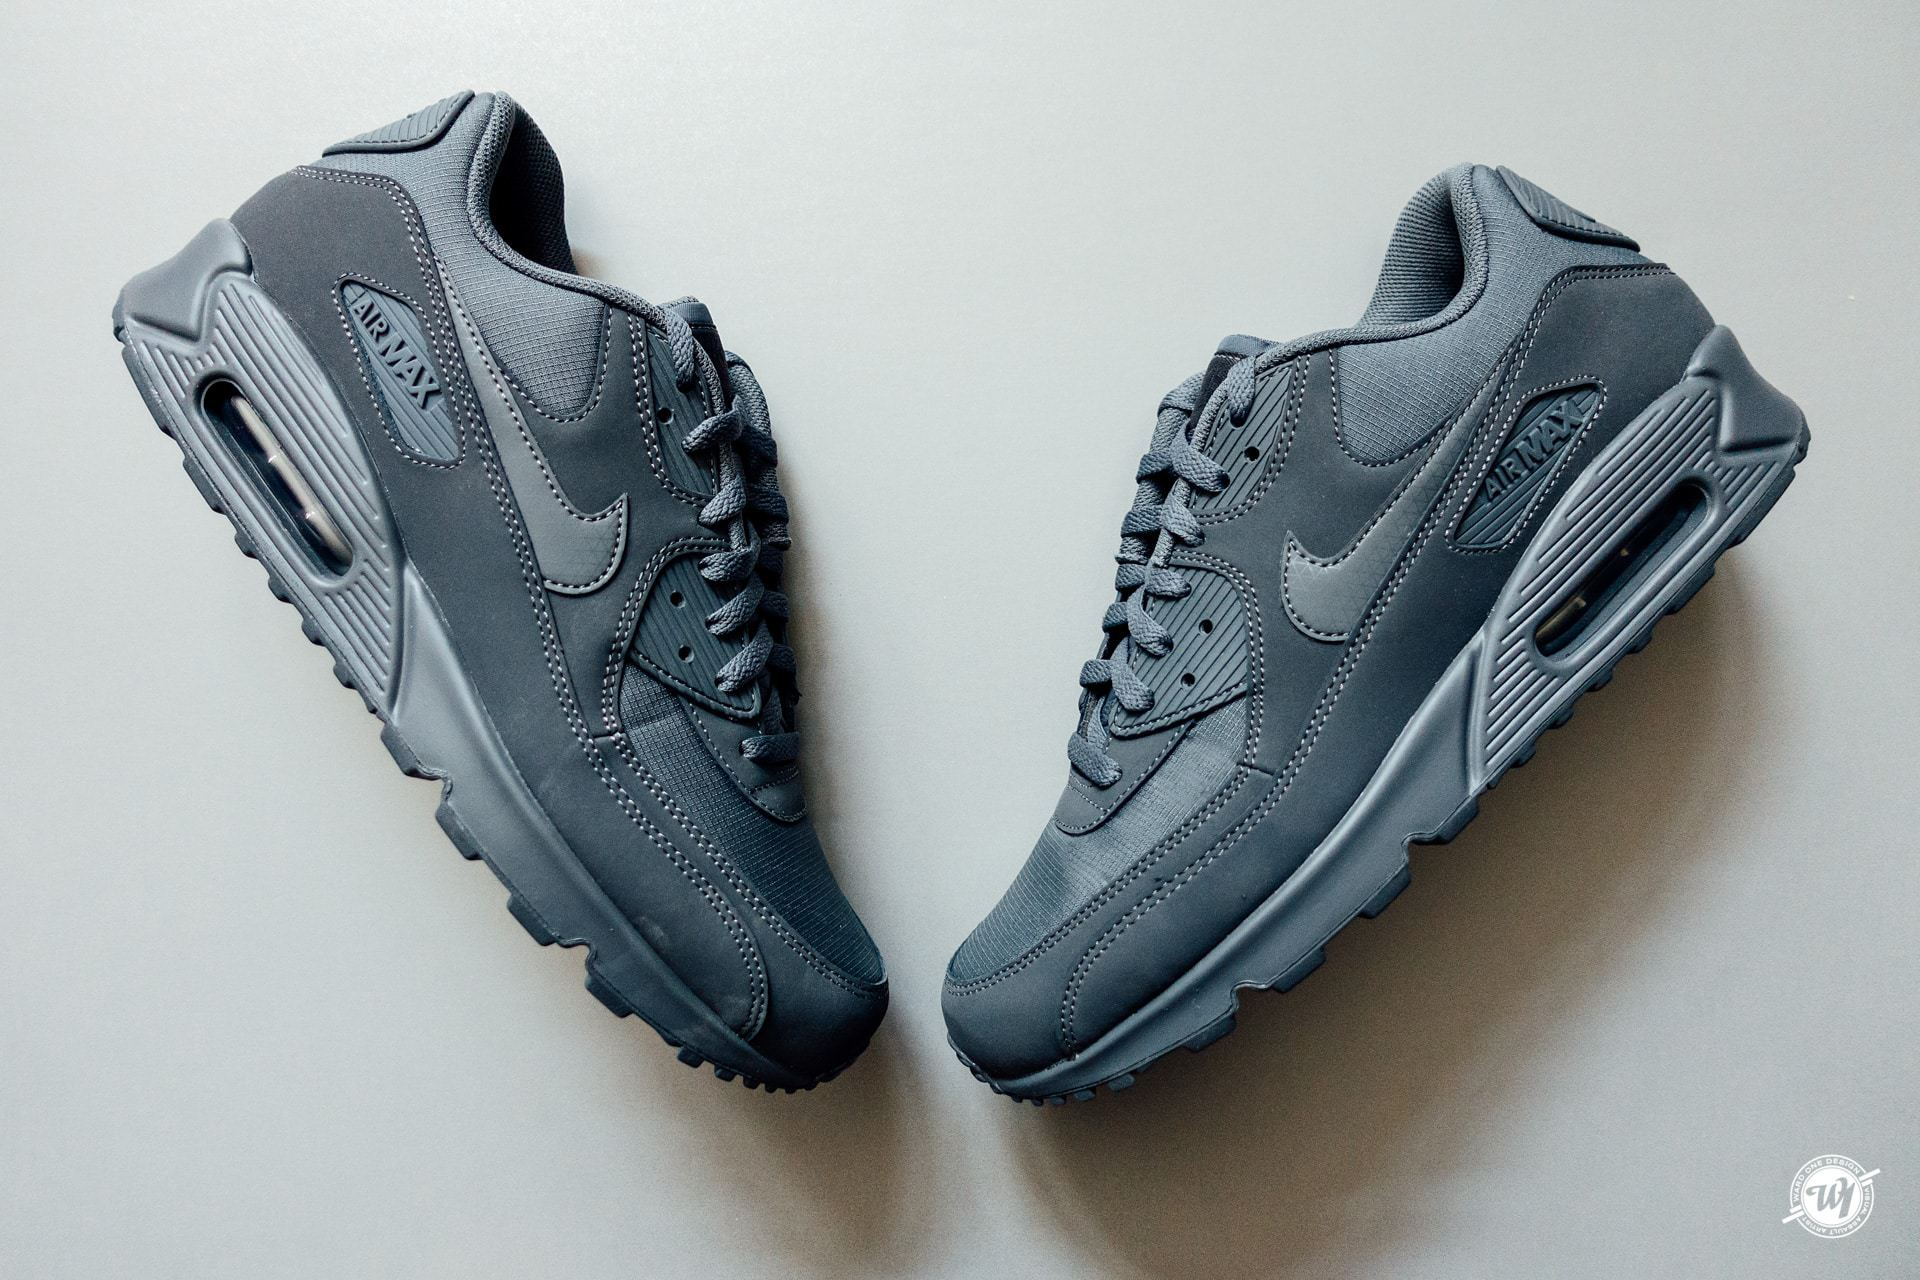 finest selection b7a04 36137 Nike Air Max 90 Essential – All Grey   Ward 1 Design